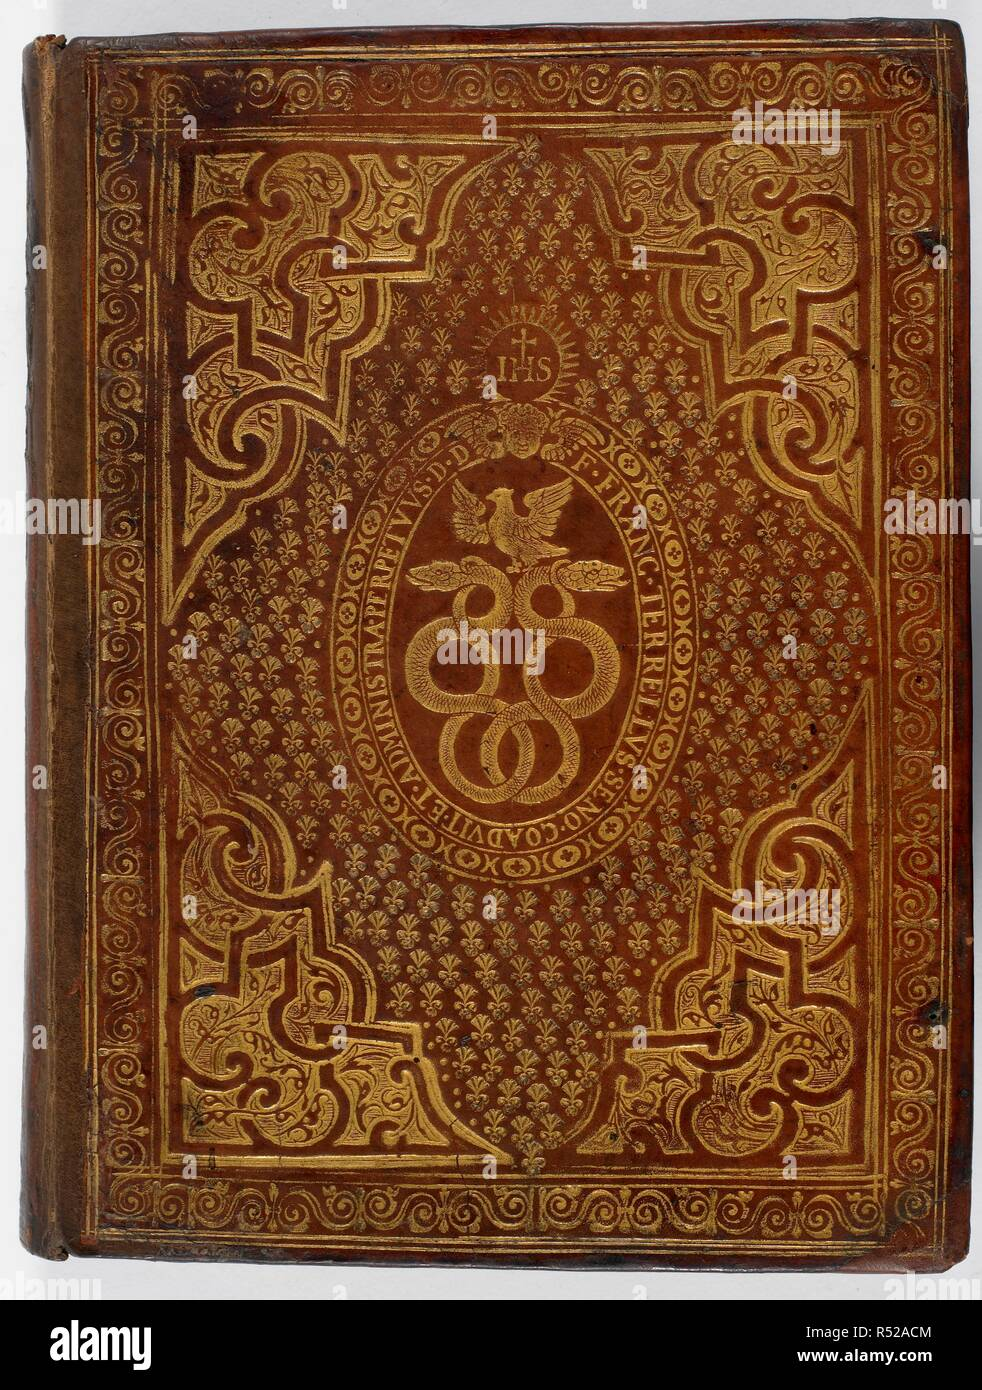 6e8d4150e9 Cover With Emblem Stock Photos   Cover With Emblem Stock Images ...